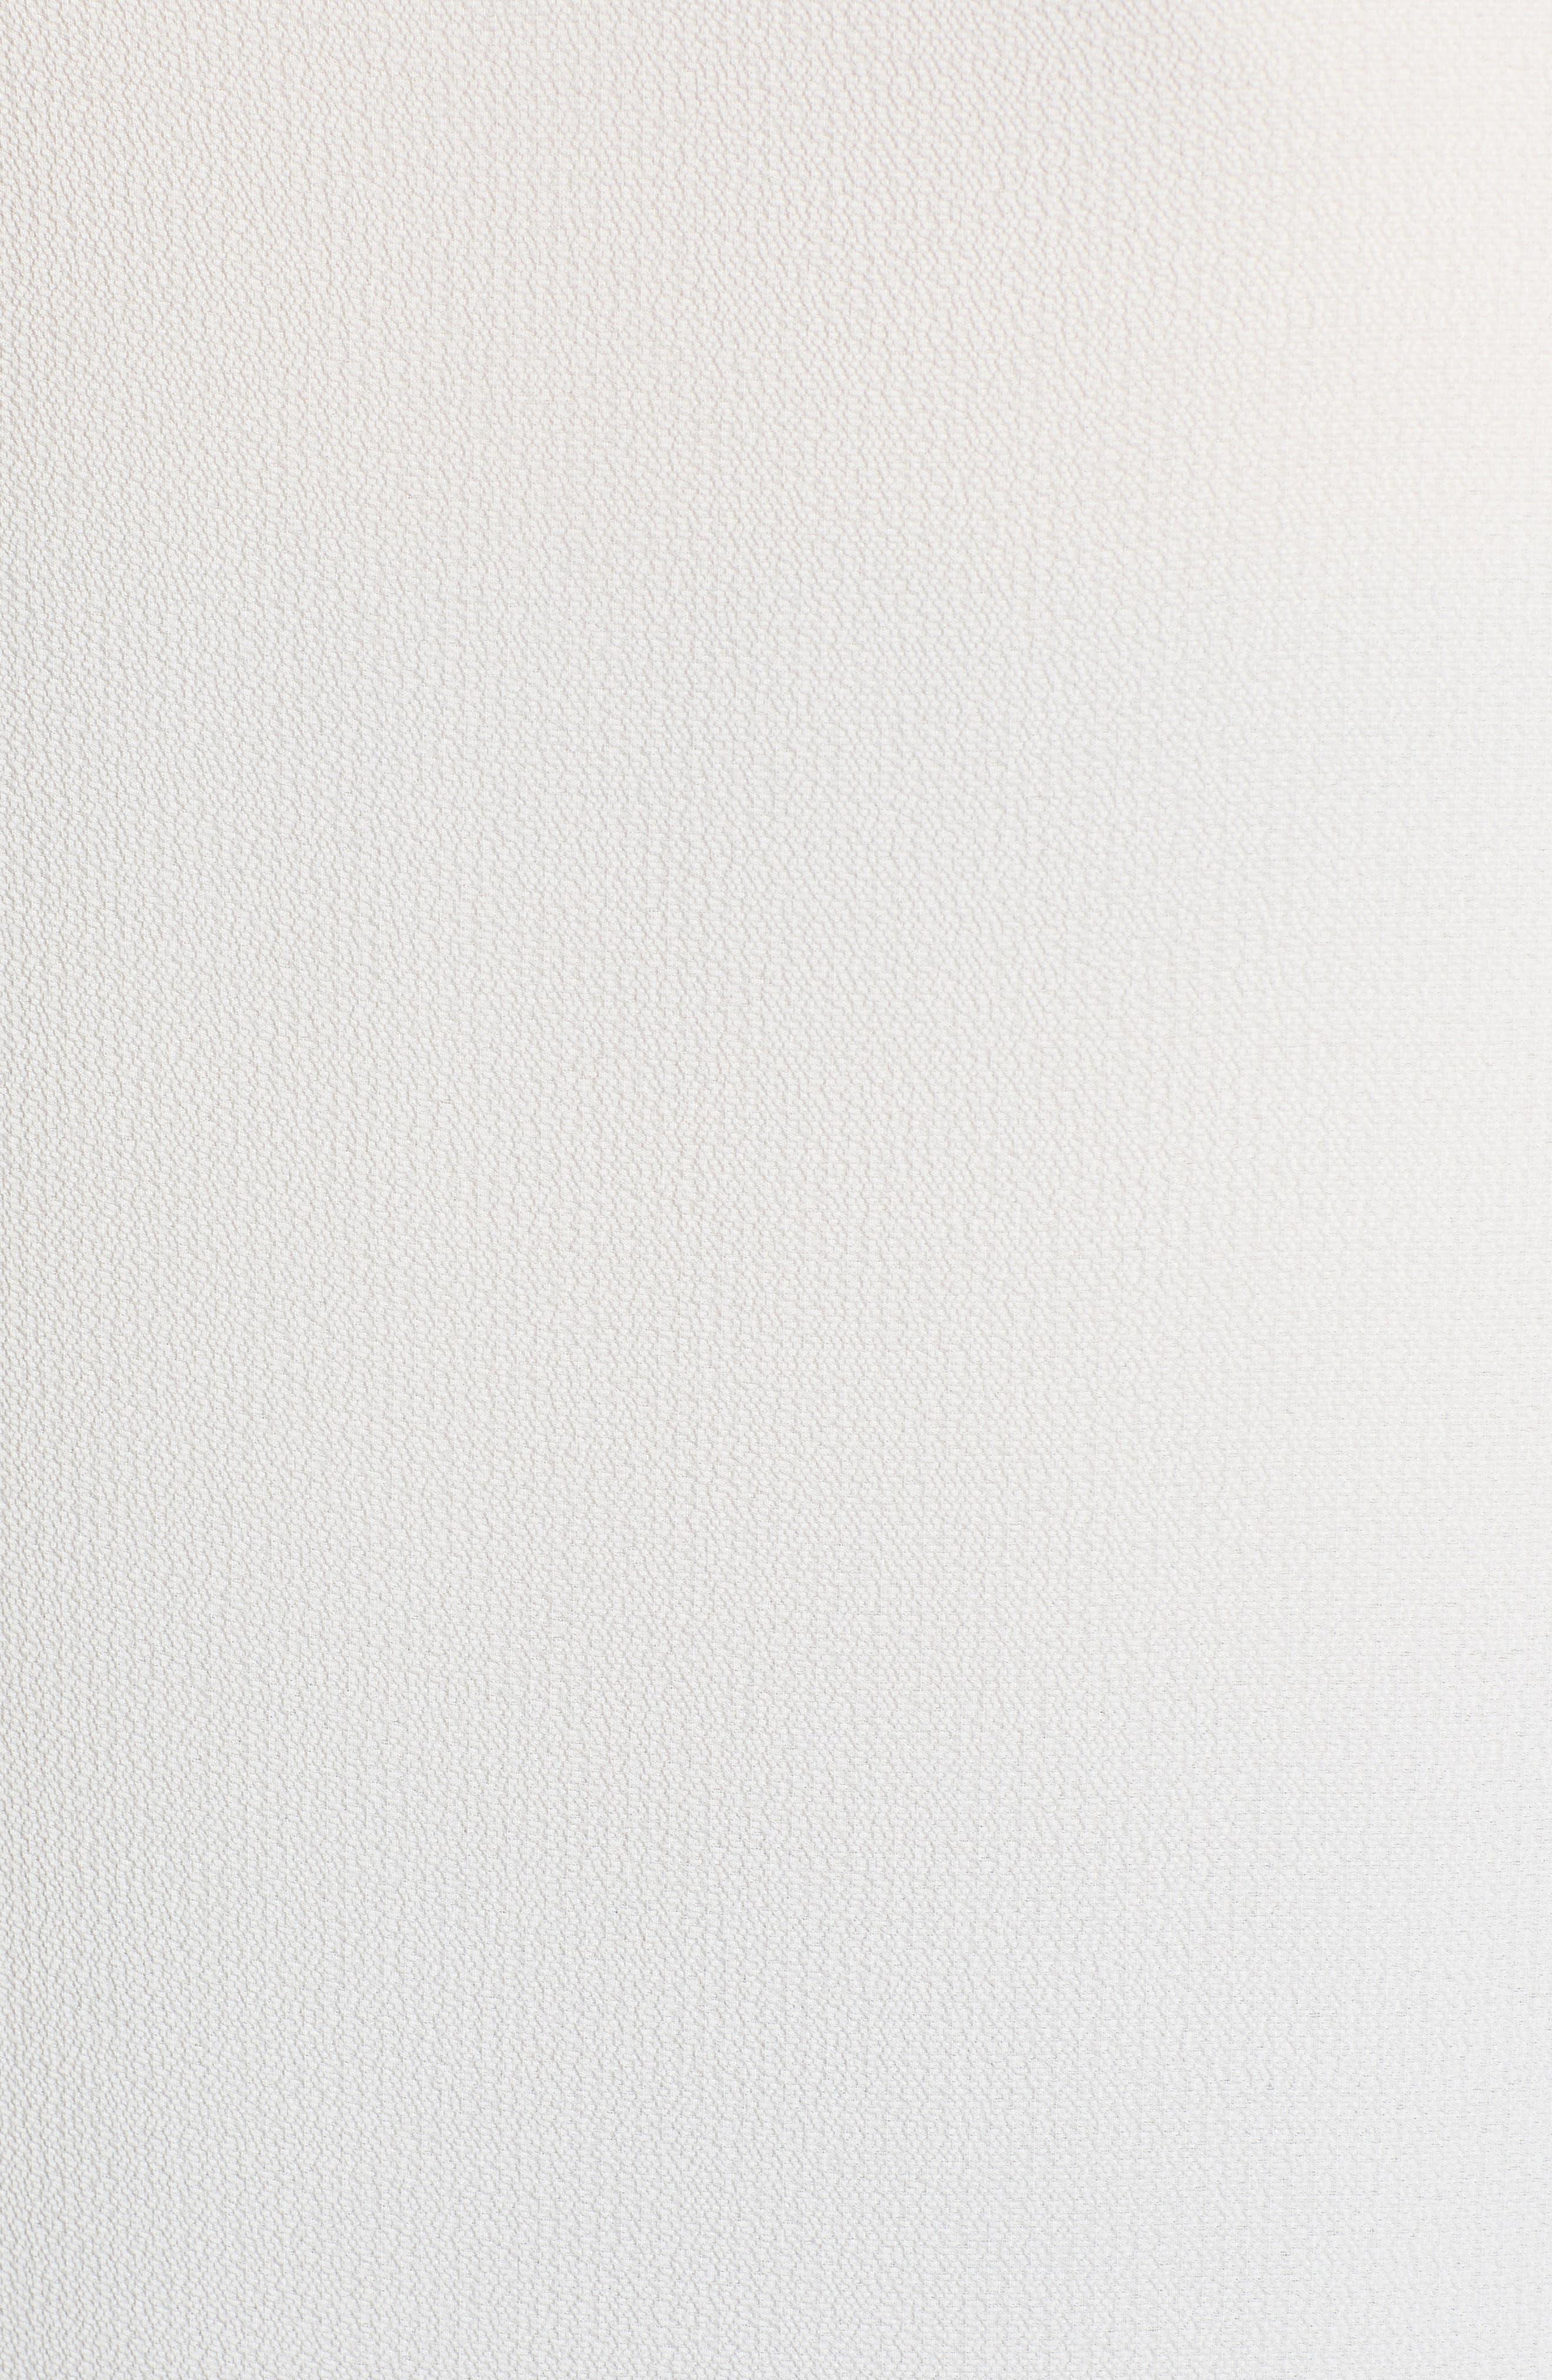 Lace Detail Stretch Crepe Tank Top,                             Alternate thumbnail 6, color,                             Ivory Cloud